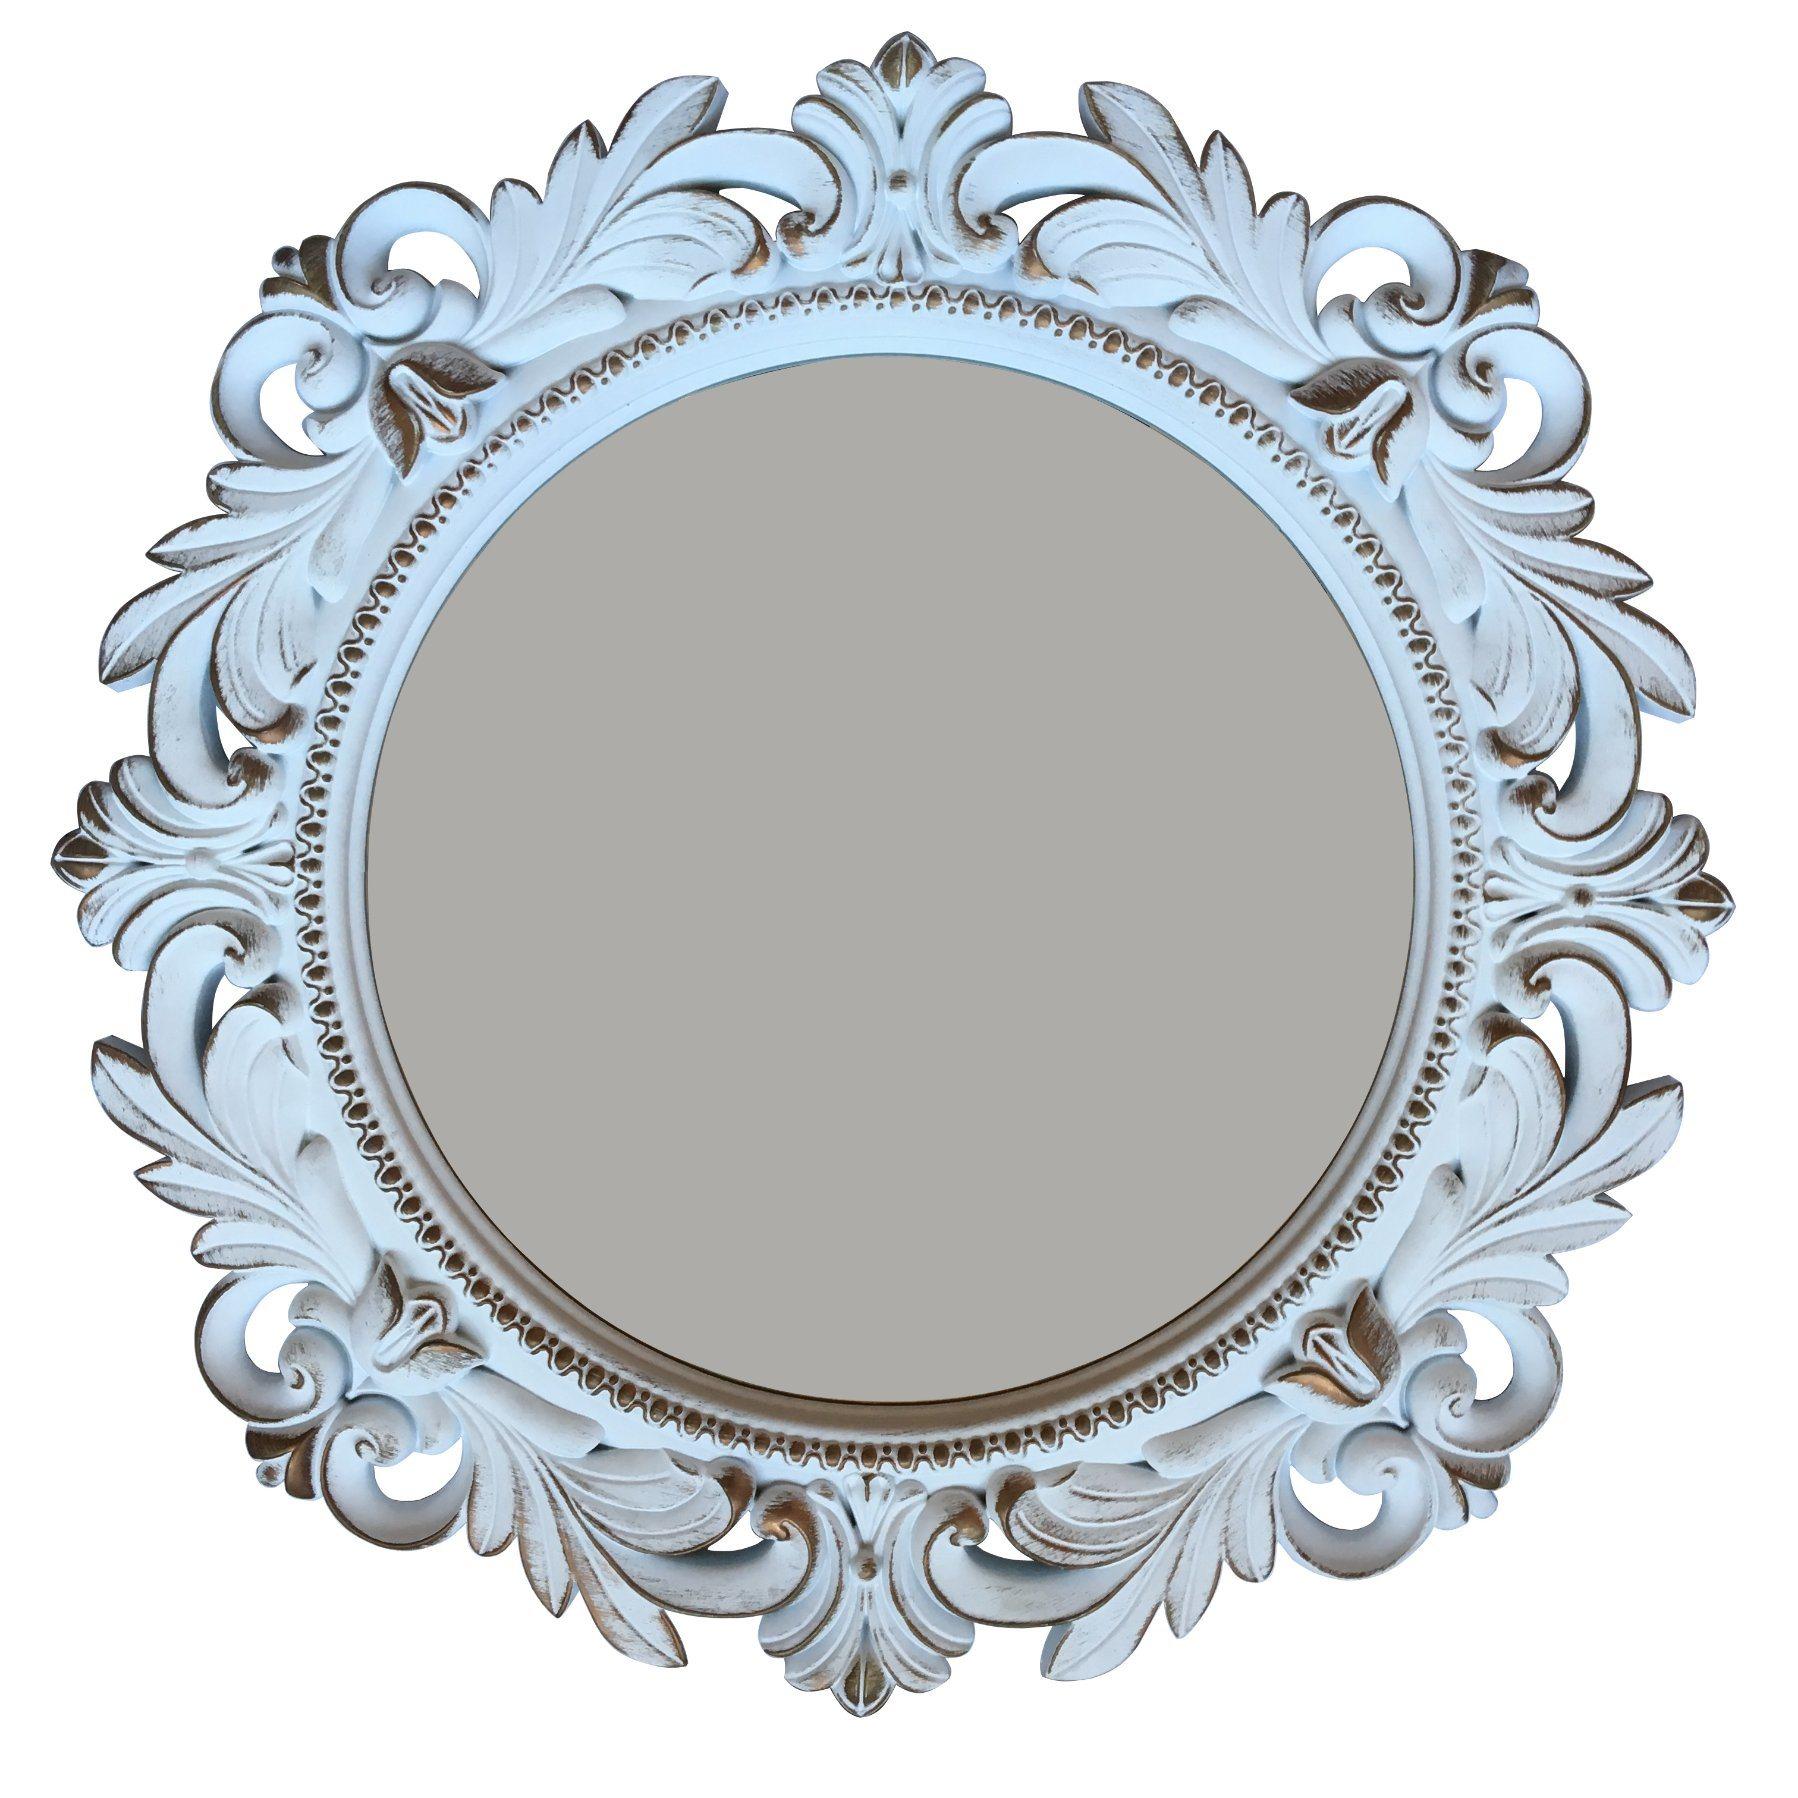 Plastic Wall Decor 20inch Frame Mirror